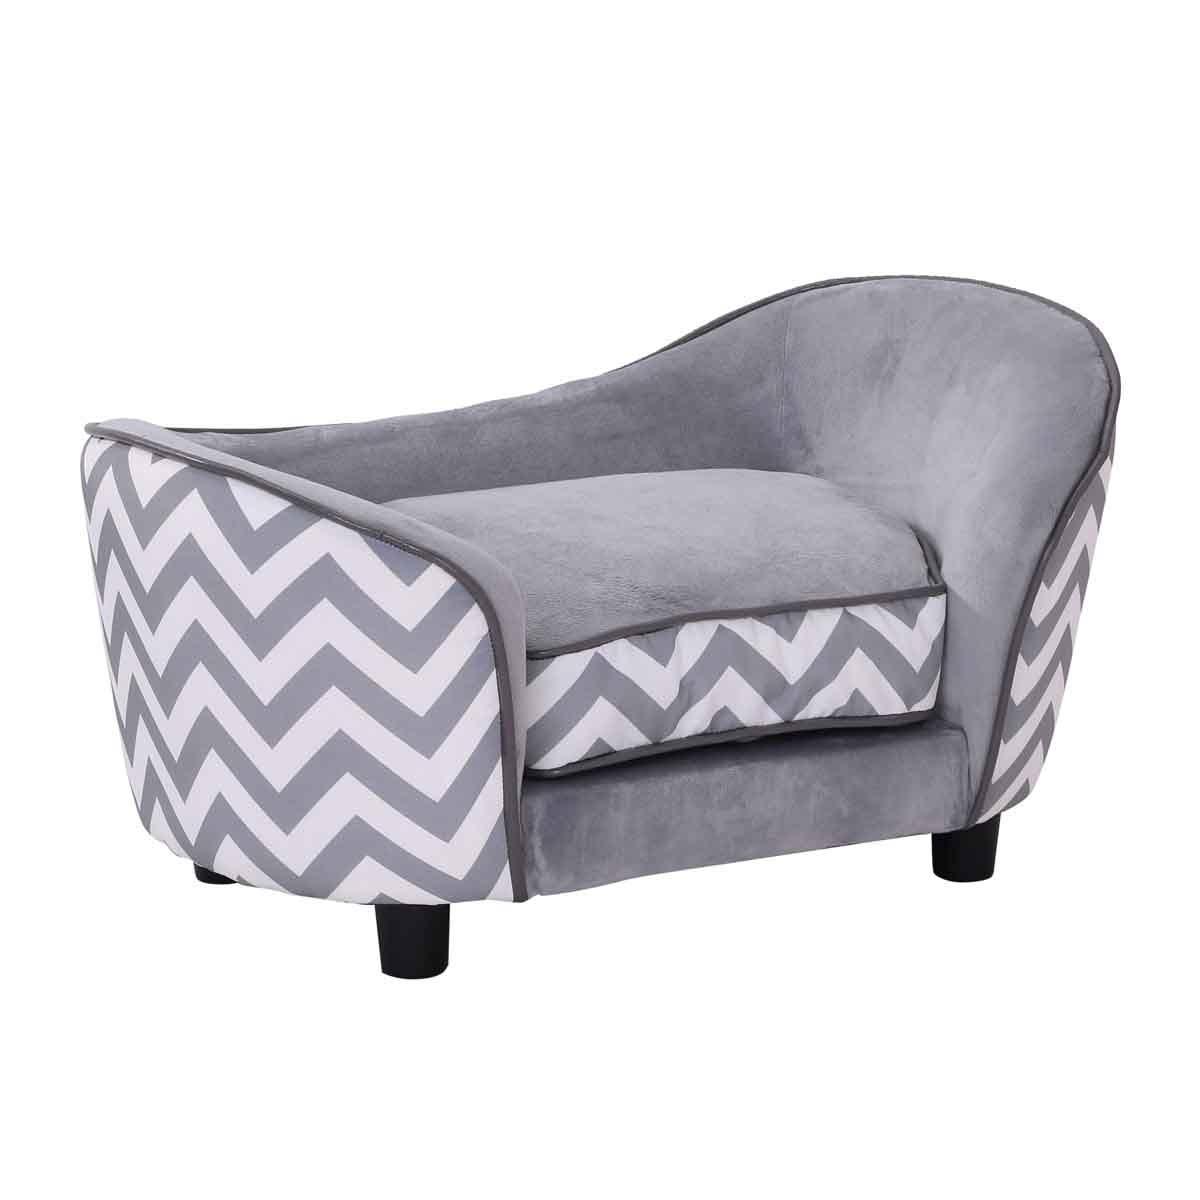 PawHut Pet Sofa W/ Comfortable Wooden Enchanted Plush Foam & Luxury Cushion - Grey